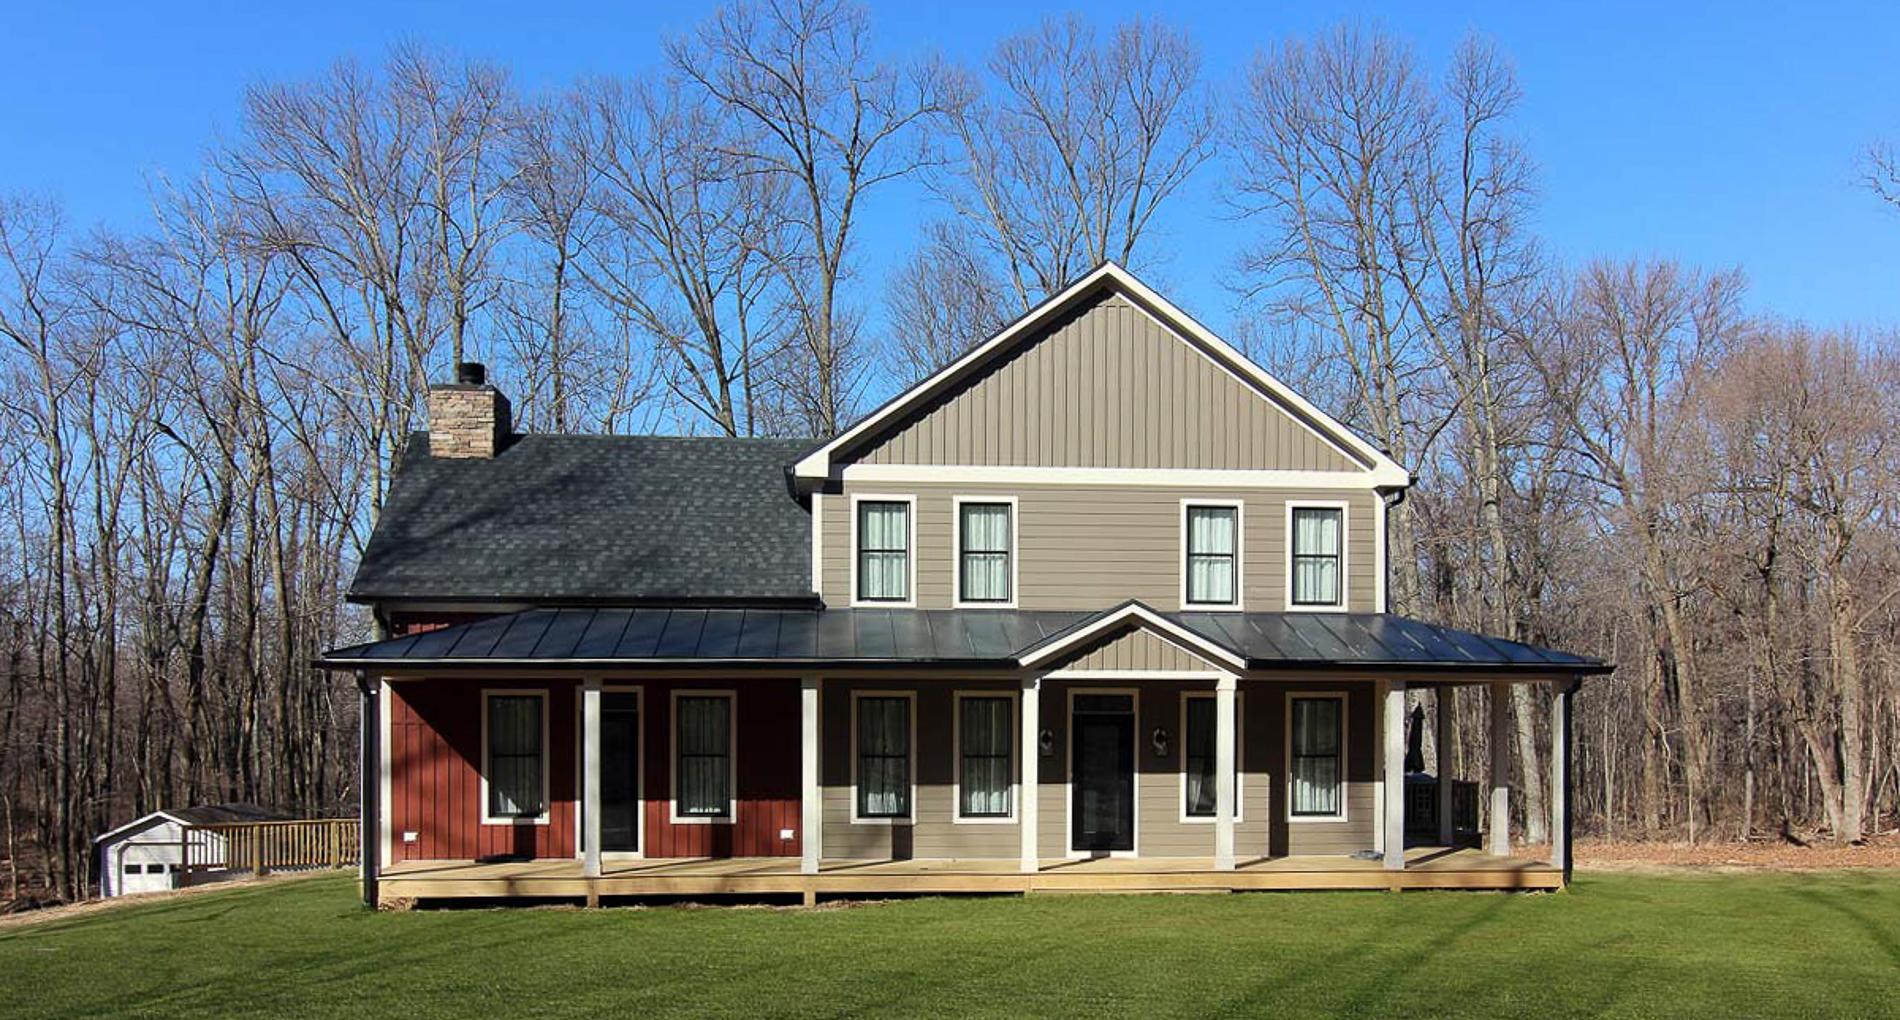 Custom Farmhouse With Wraparound Porch